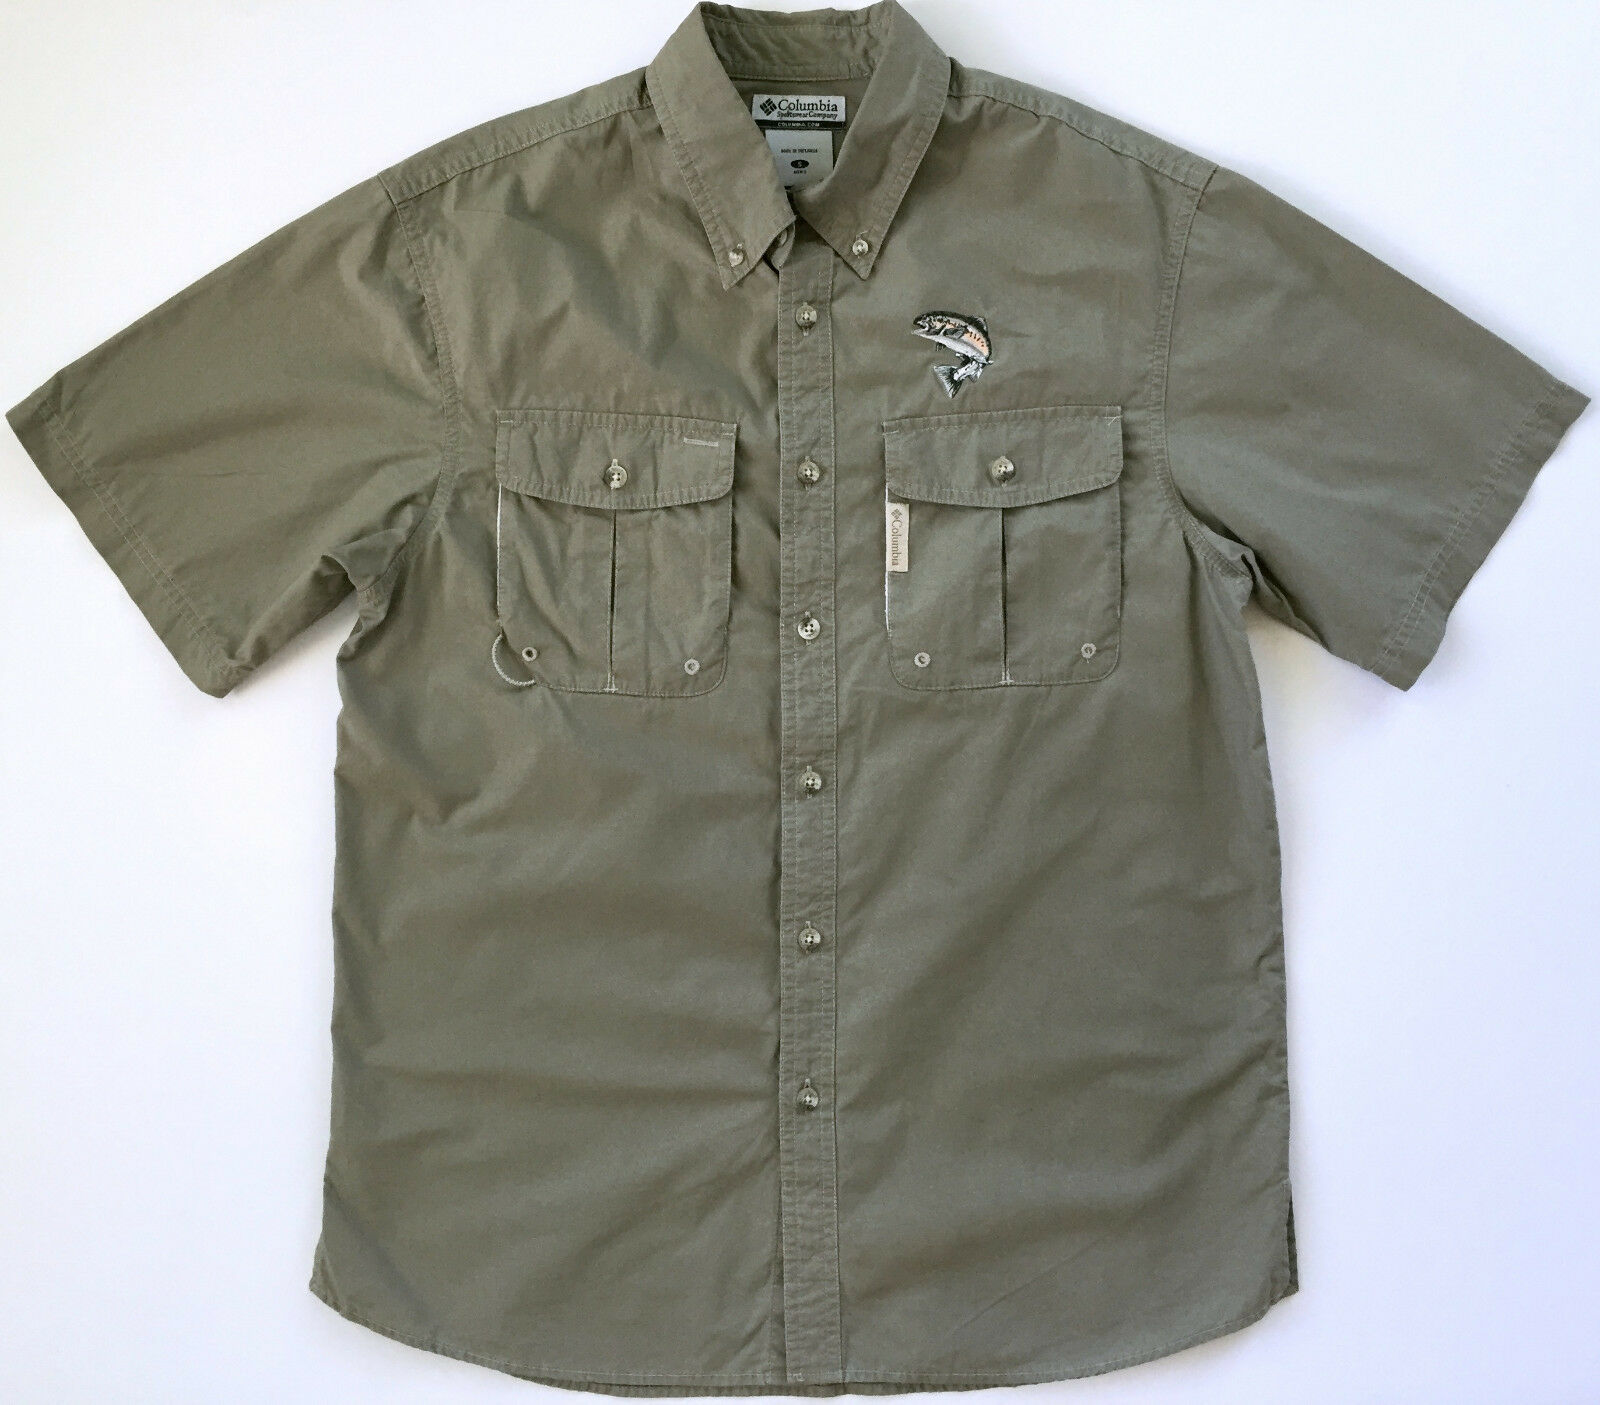 COLUMBIA PFG Performance Mens Short Sleeve Beige Green Vented Fishing Shirt Sz S